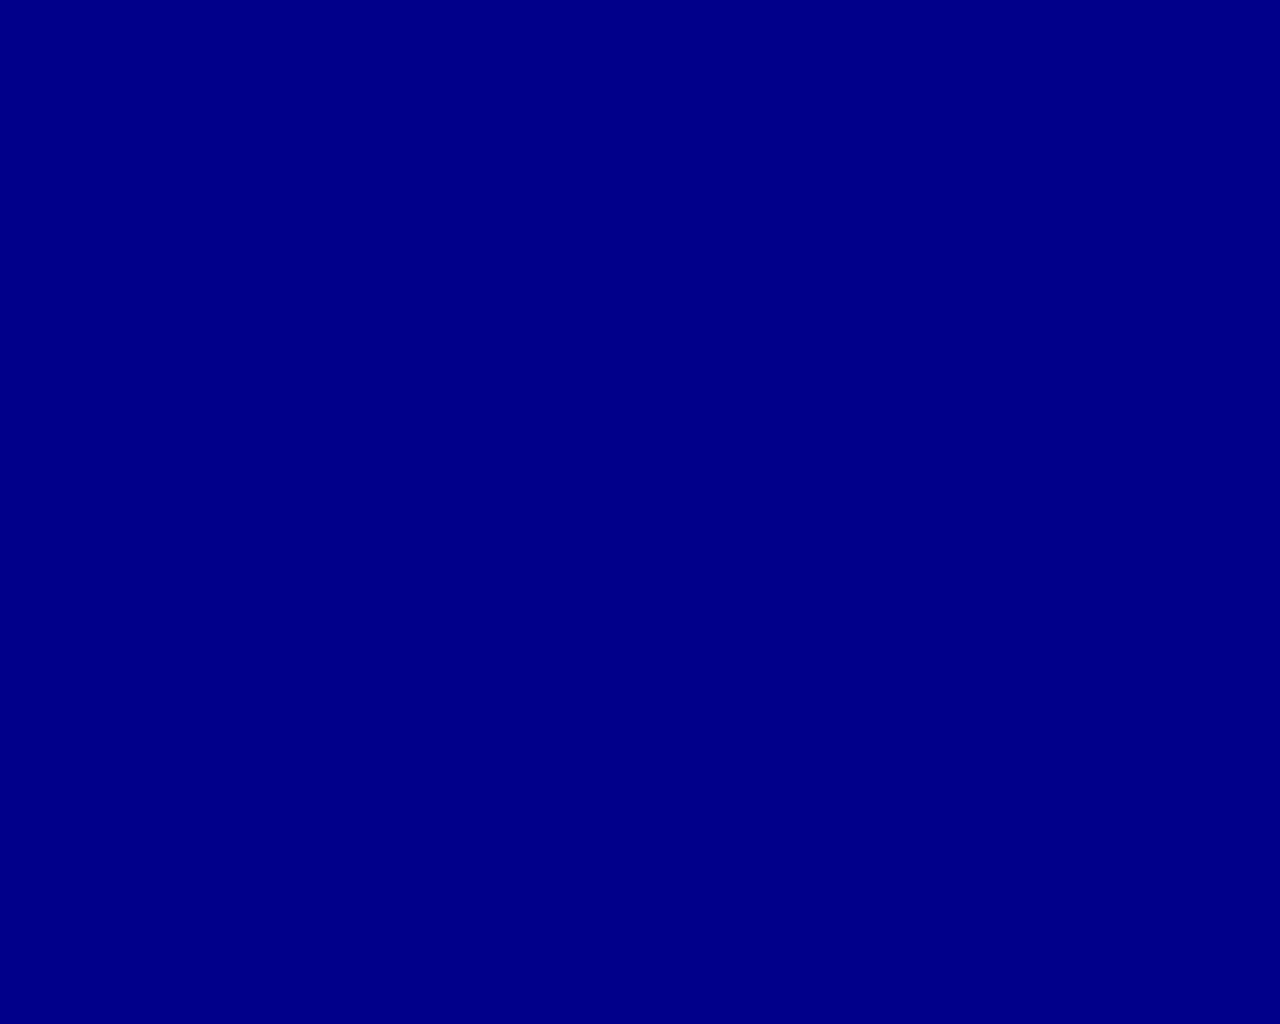 1280x1024 Dark Blue Solid Color Background